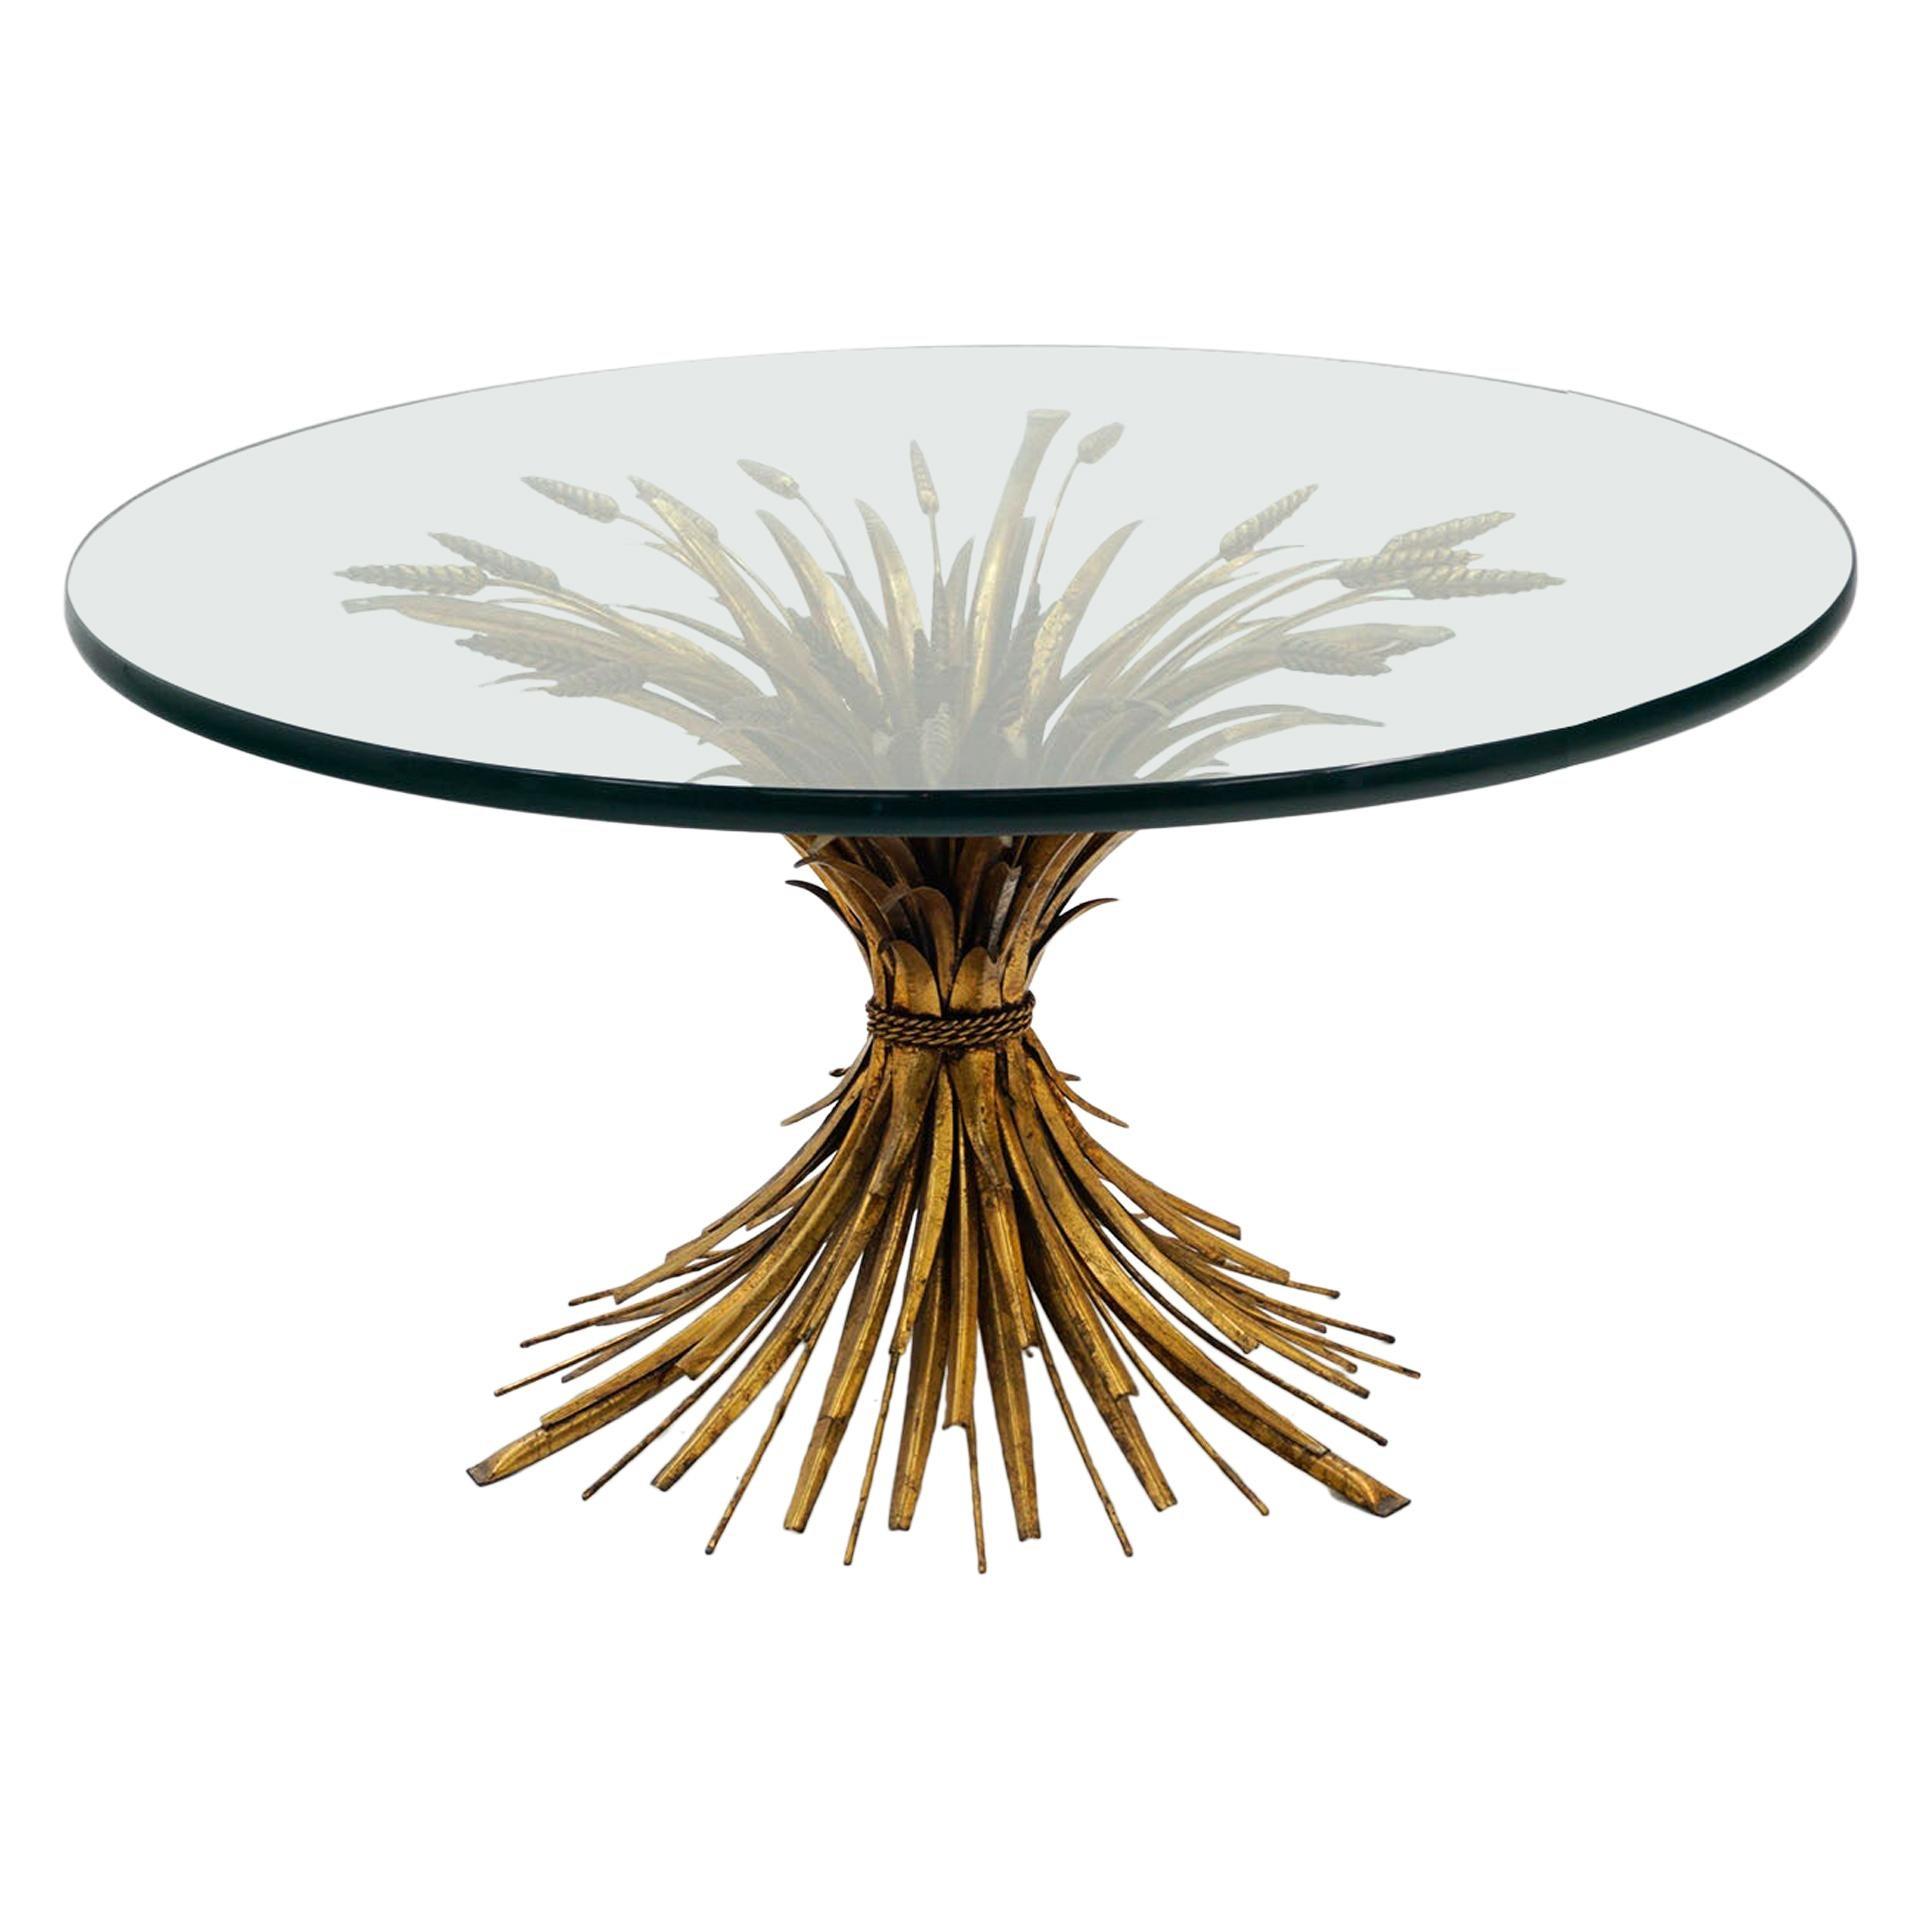 "Glass and Brass Italian Coffee Table, Sheaf of Wheat Base, Original 3/4"" Glass"